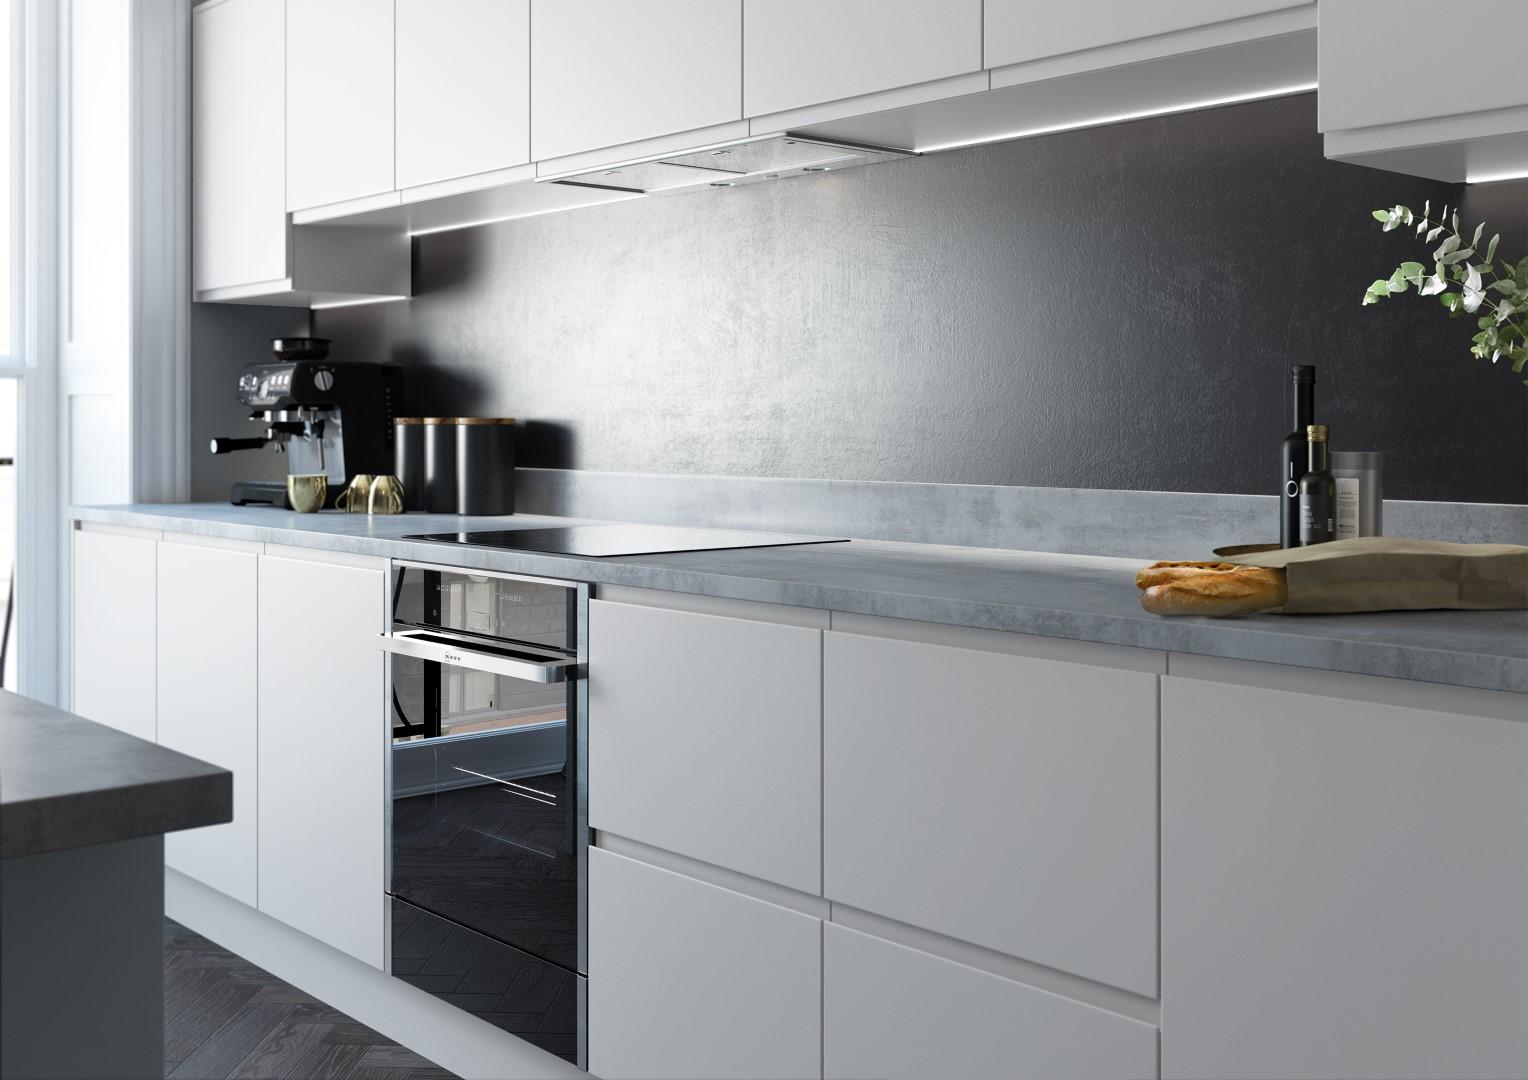 Strada Matte Light Grey and Dust Grey - Kitchen Design - Alan Kelly Kitchens - Waterford - 1